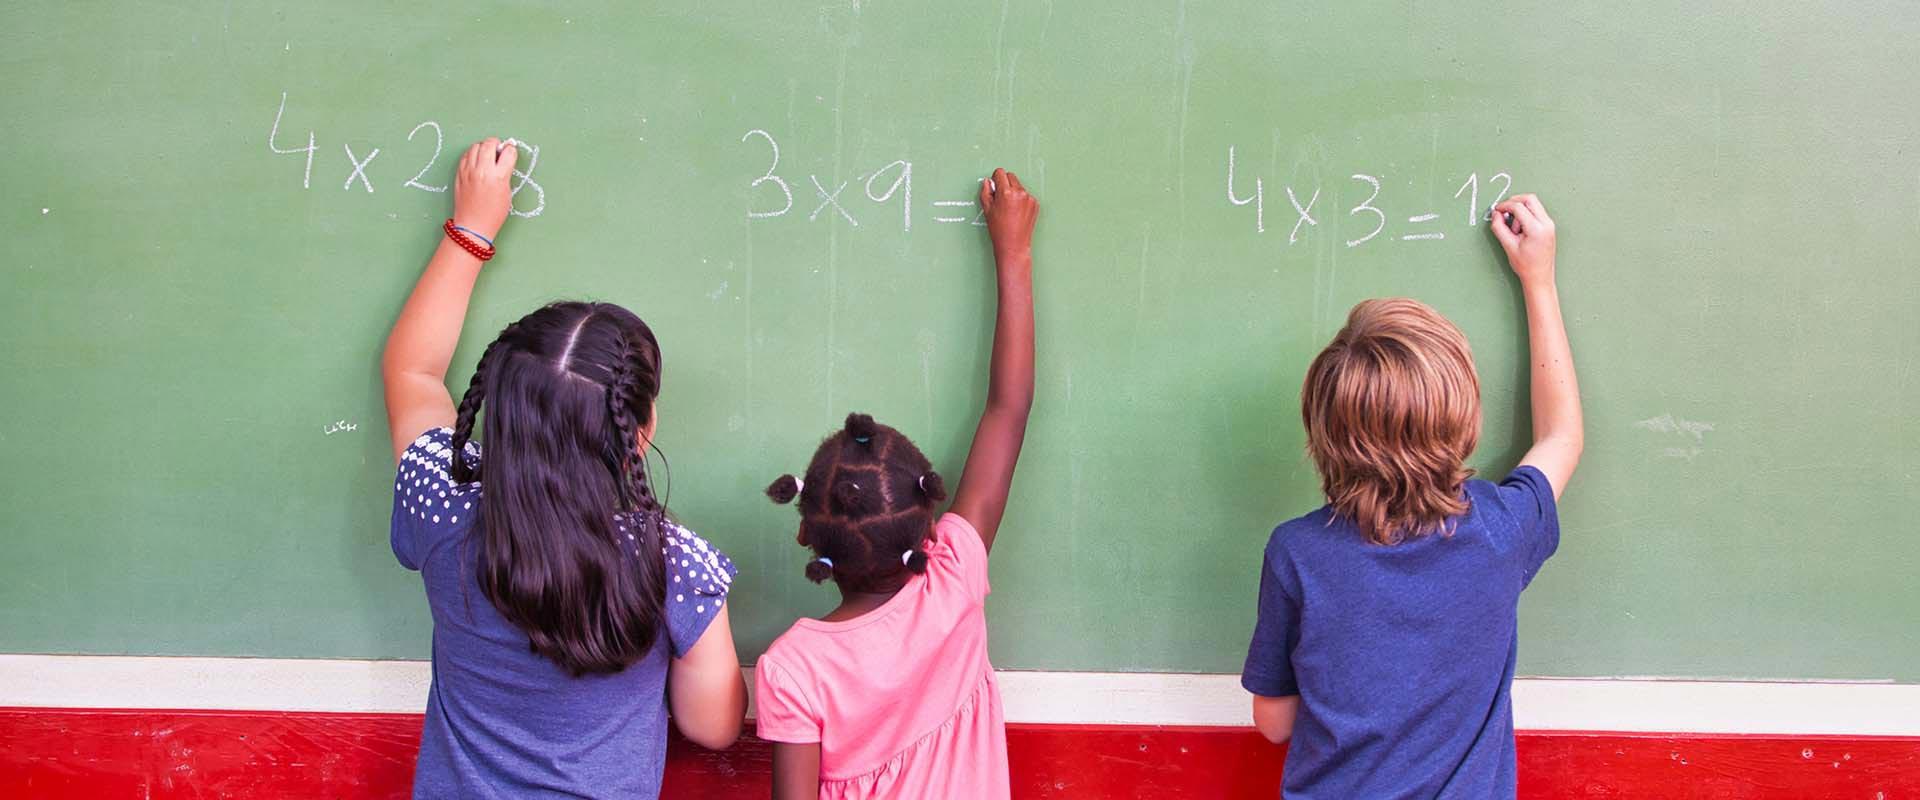 San Juan School Calendar 2020 - Publicholidays.ar with regard to Elementary School San Digeo Holiday Calendar 2022